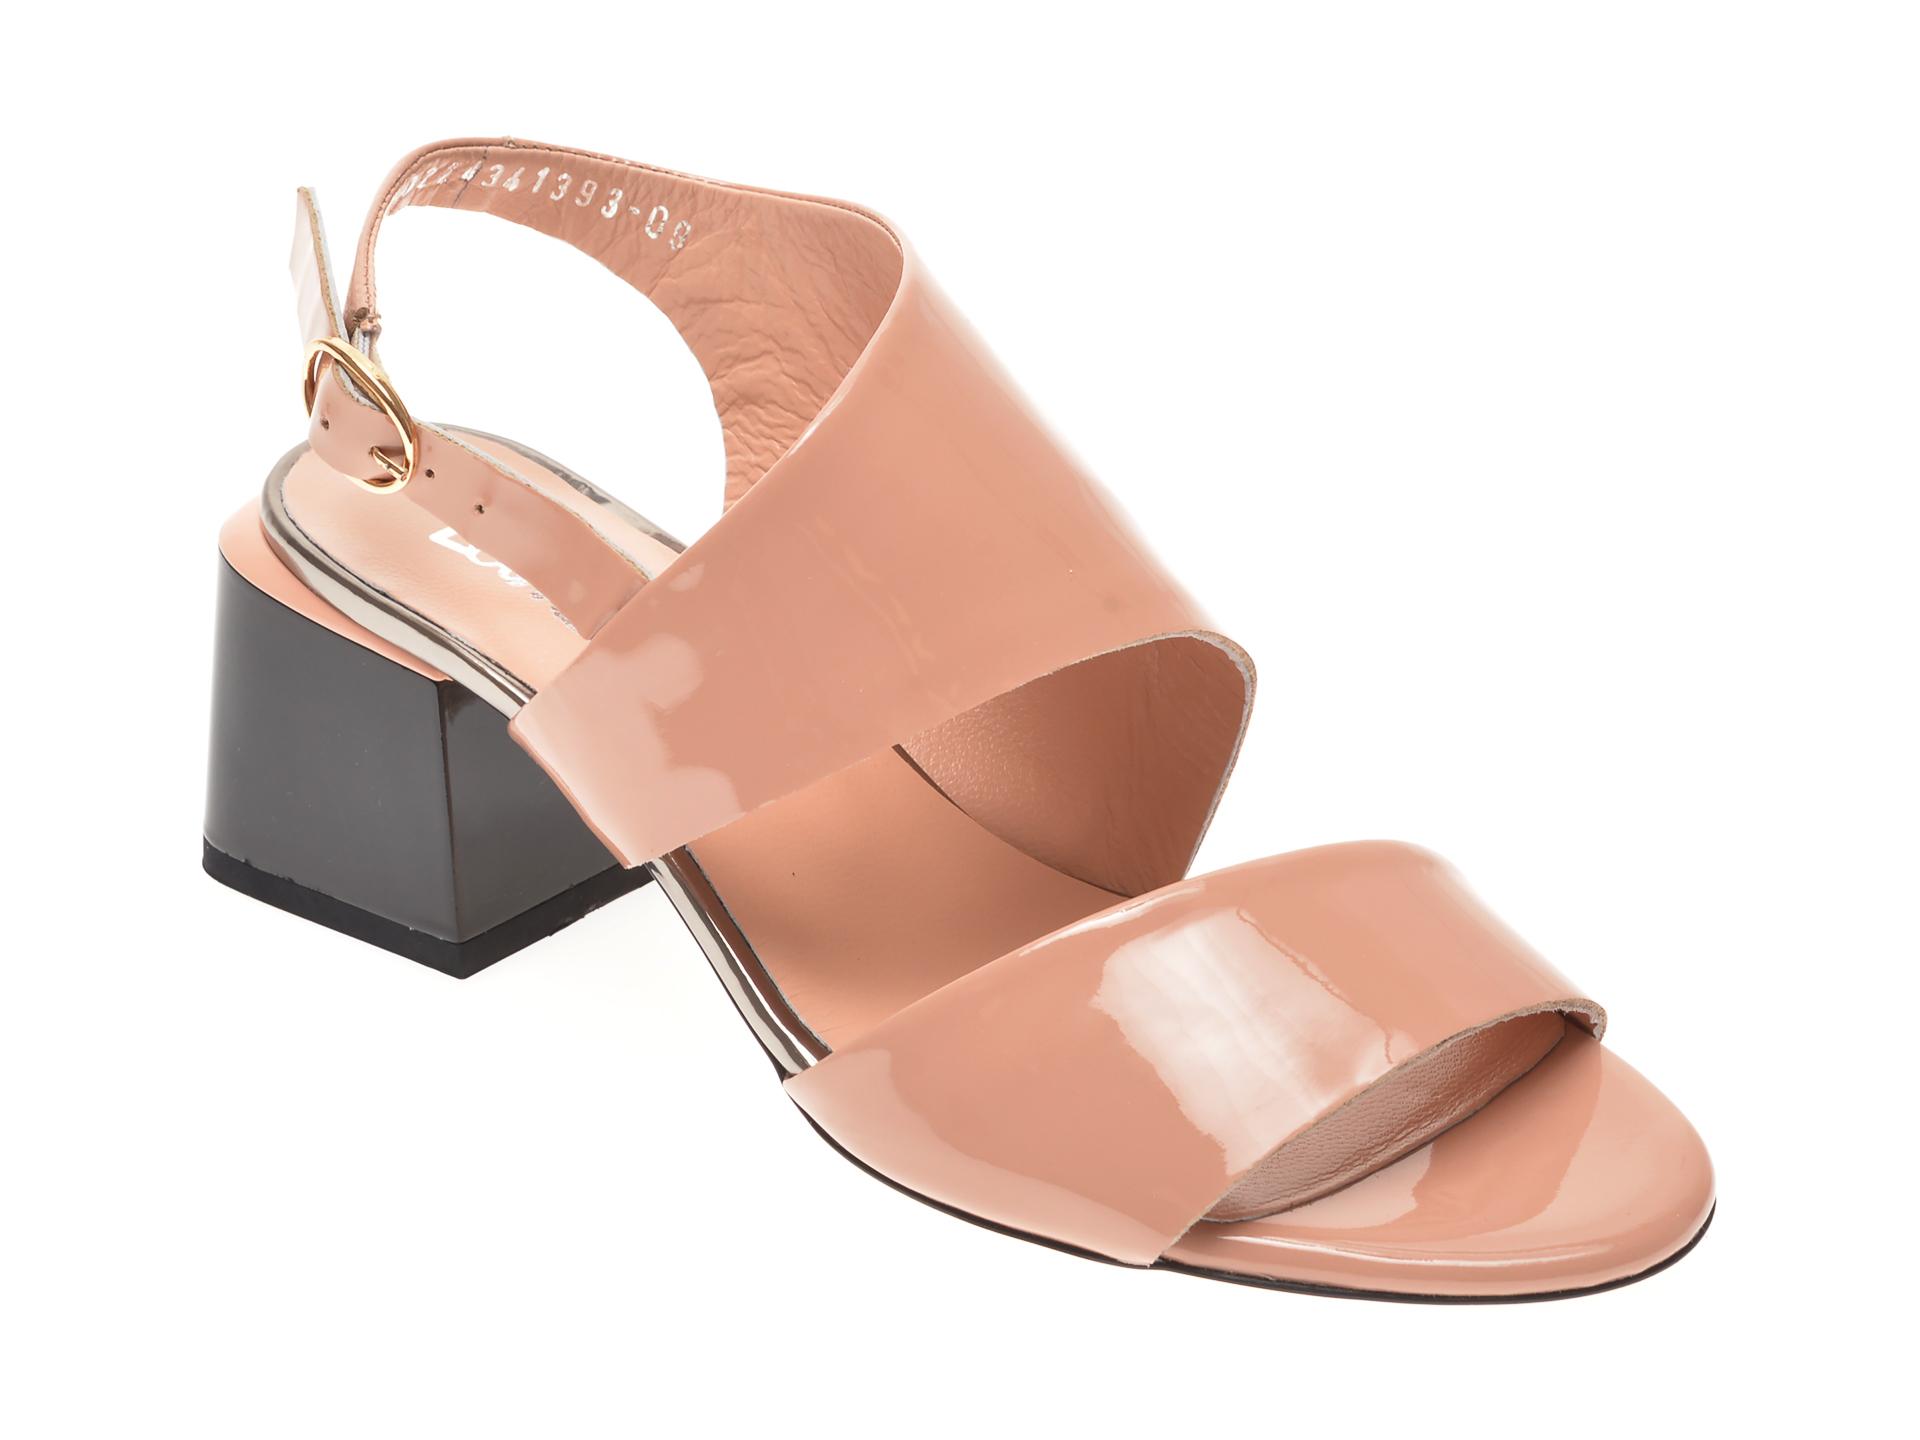 Sandale MISS LIZA nude, 1182434, din lac piele